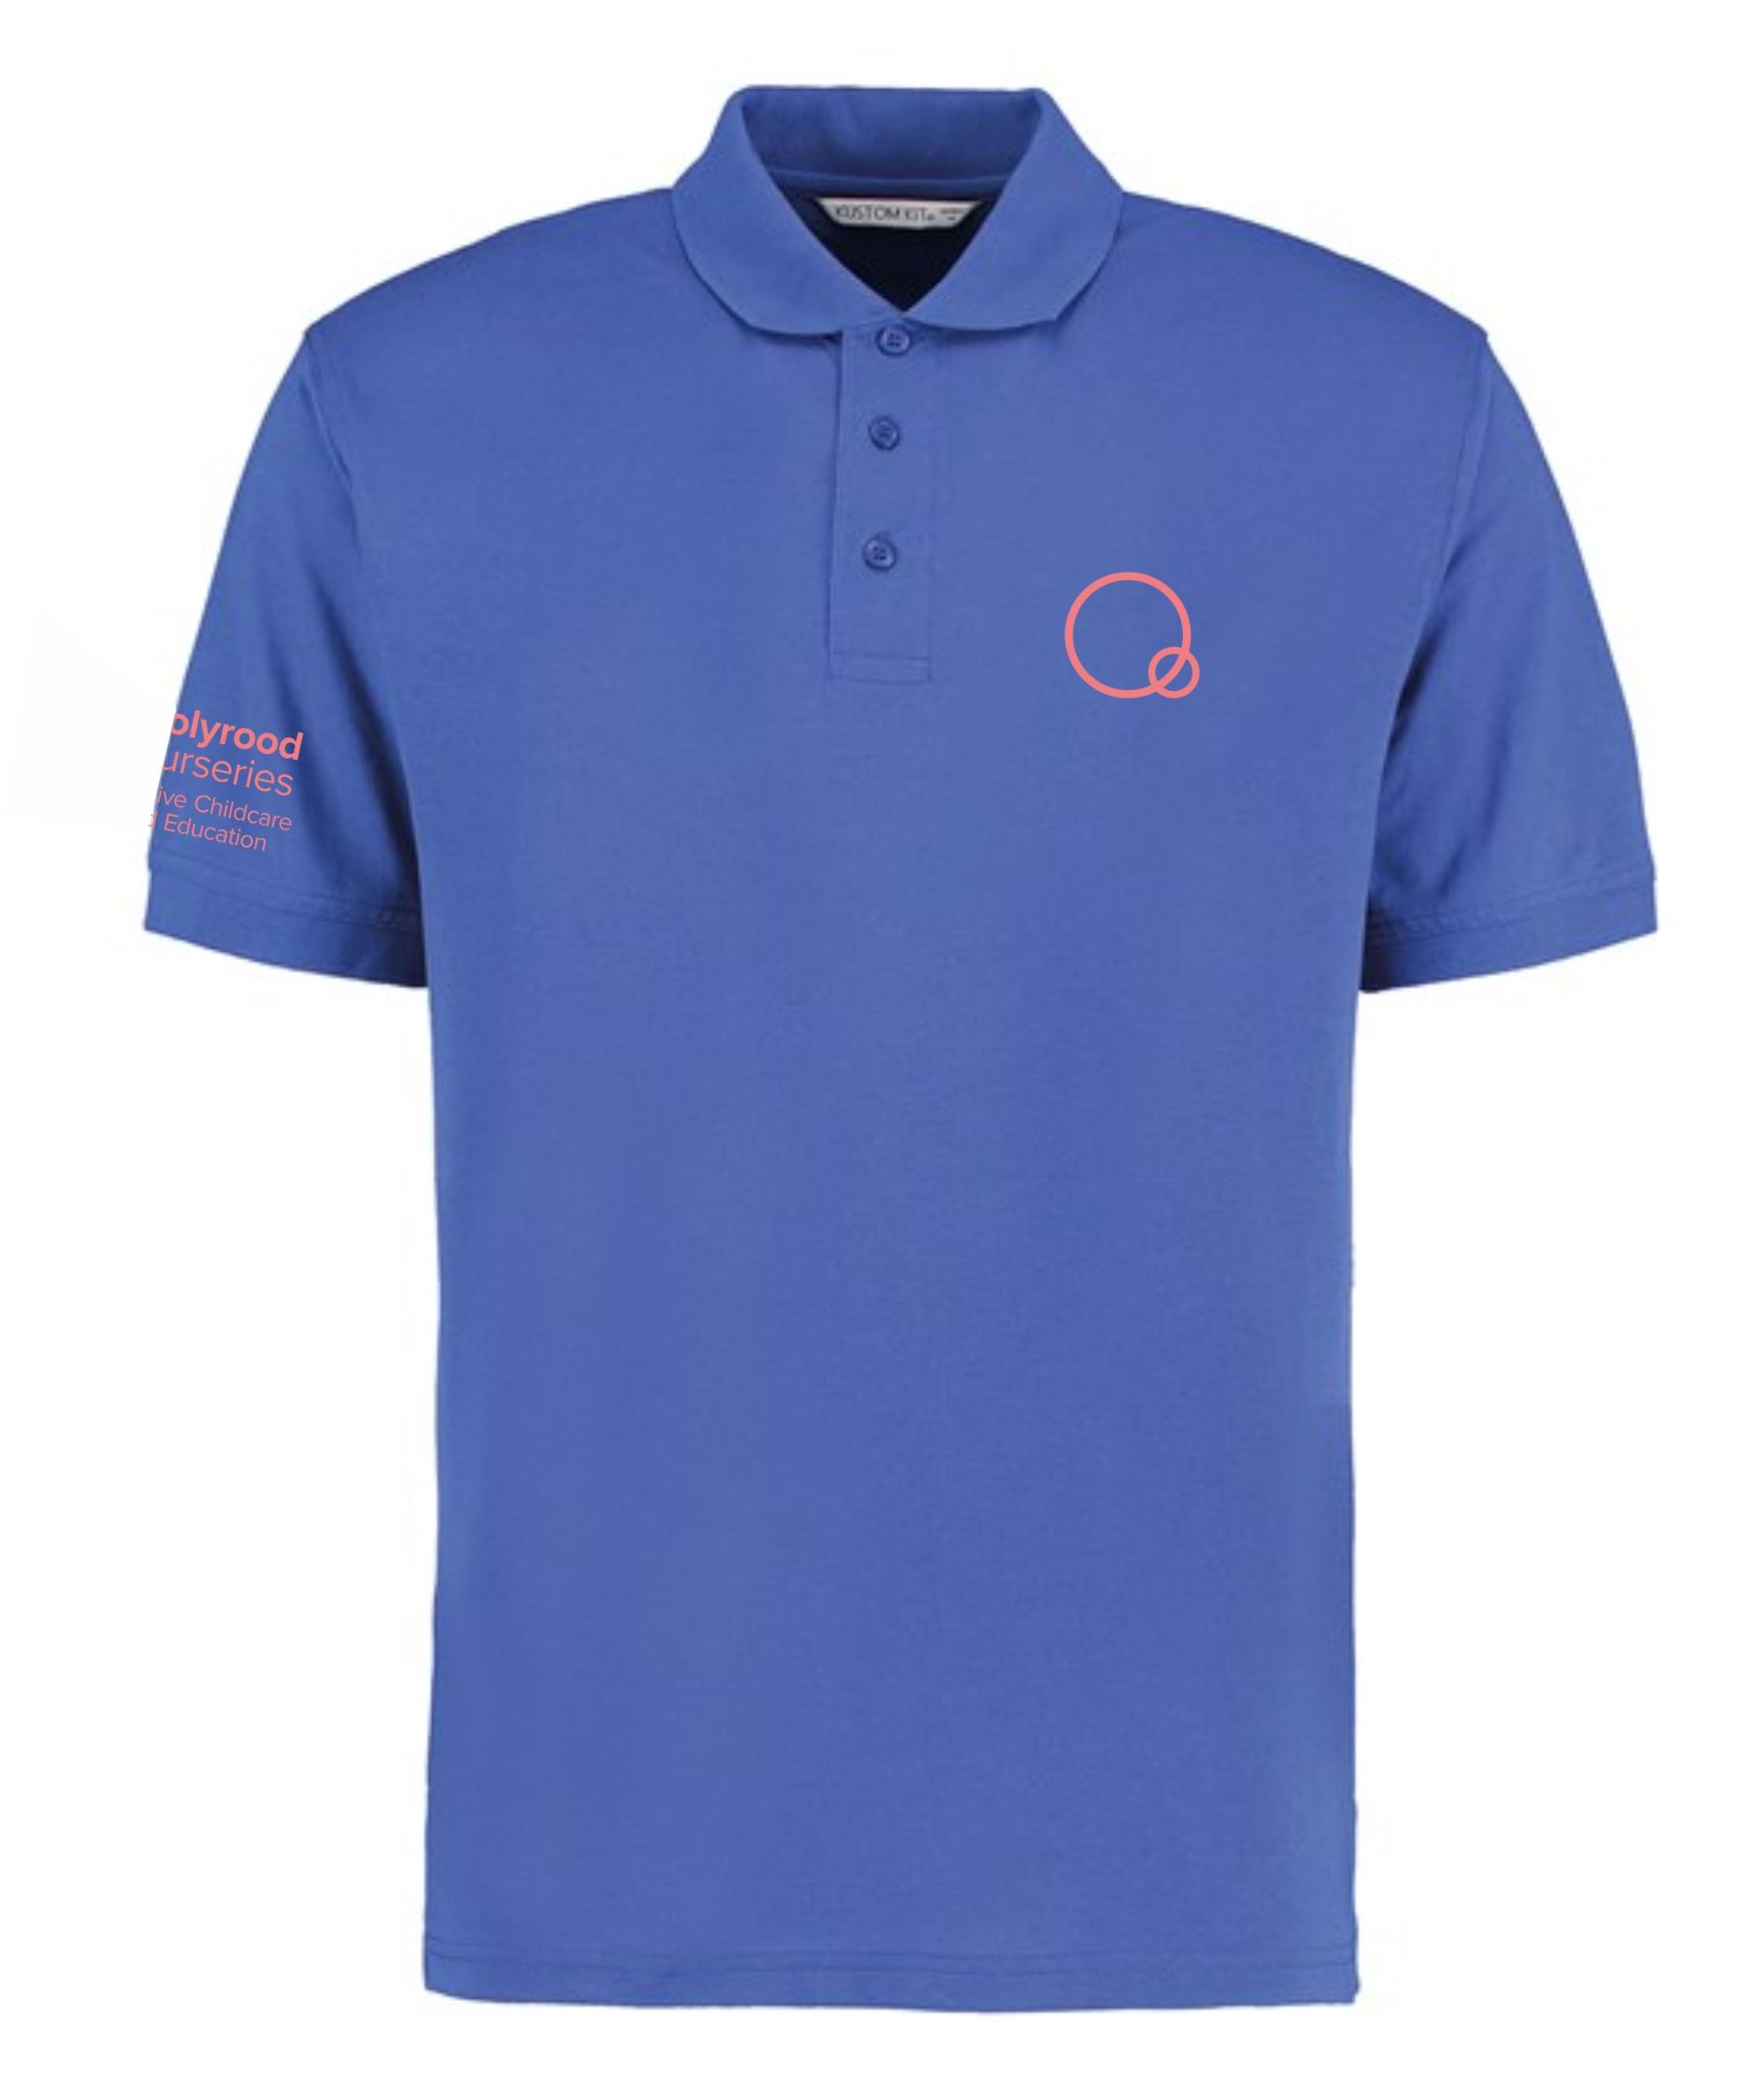 Holyrood Staff Uniform